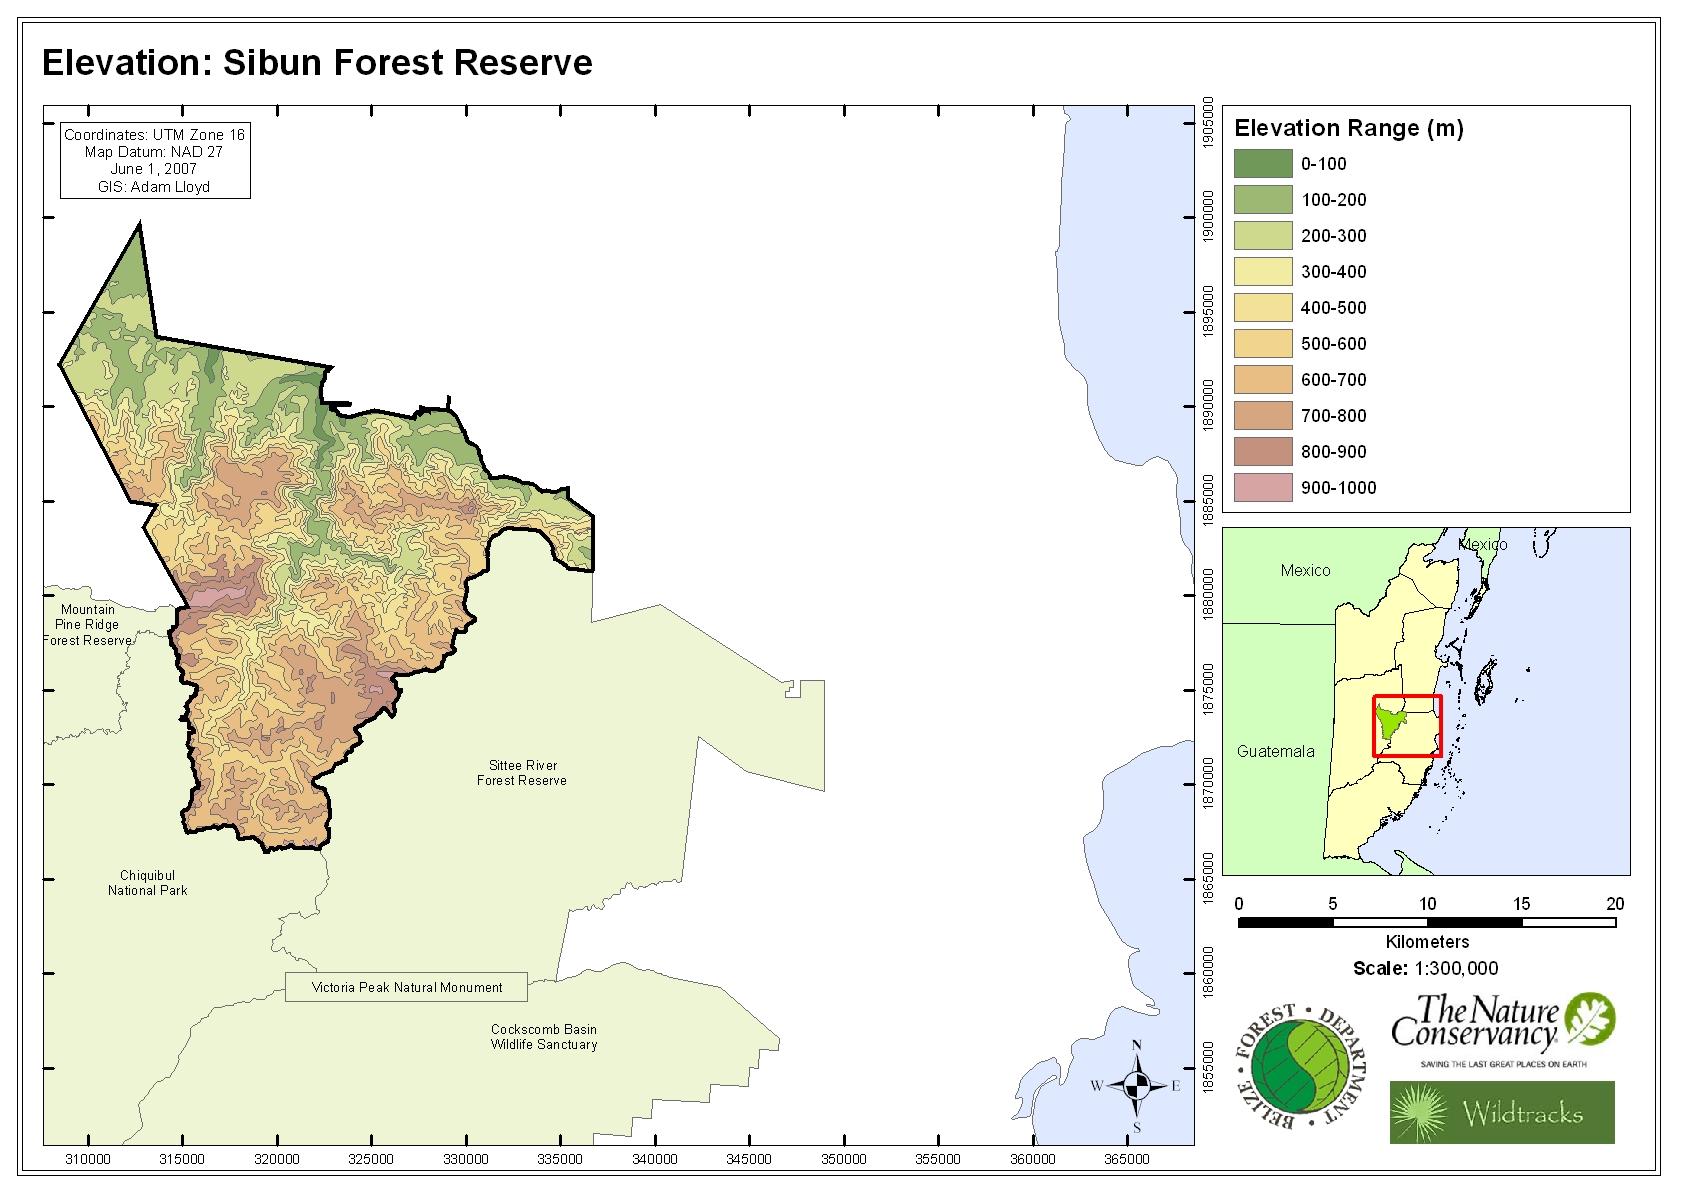 Elevation: Sibun Forest Reserve